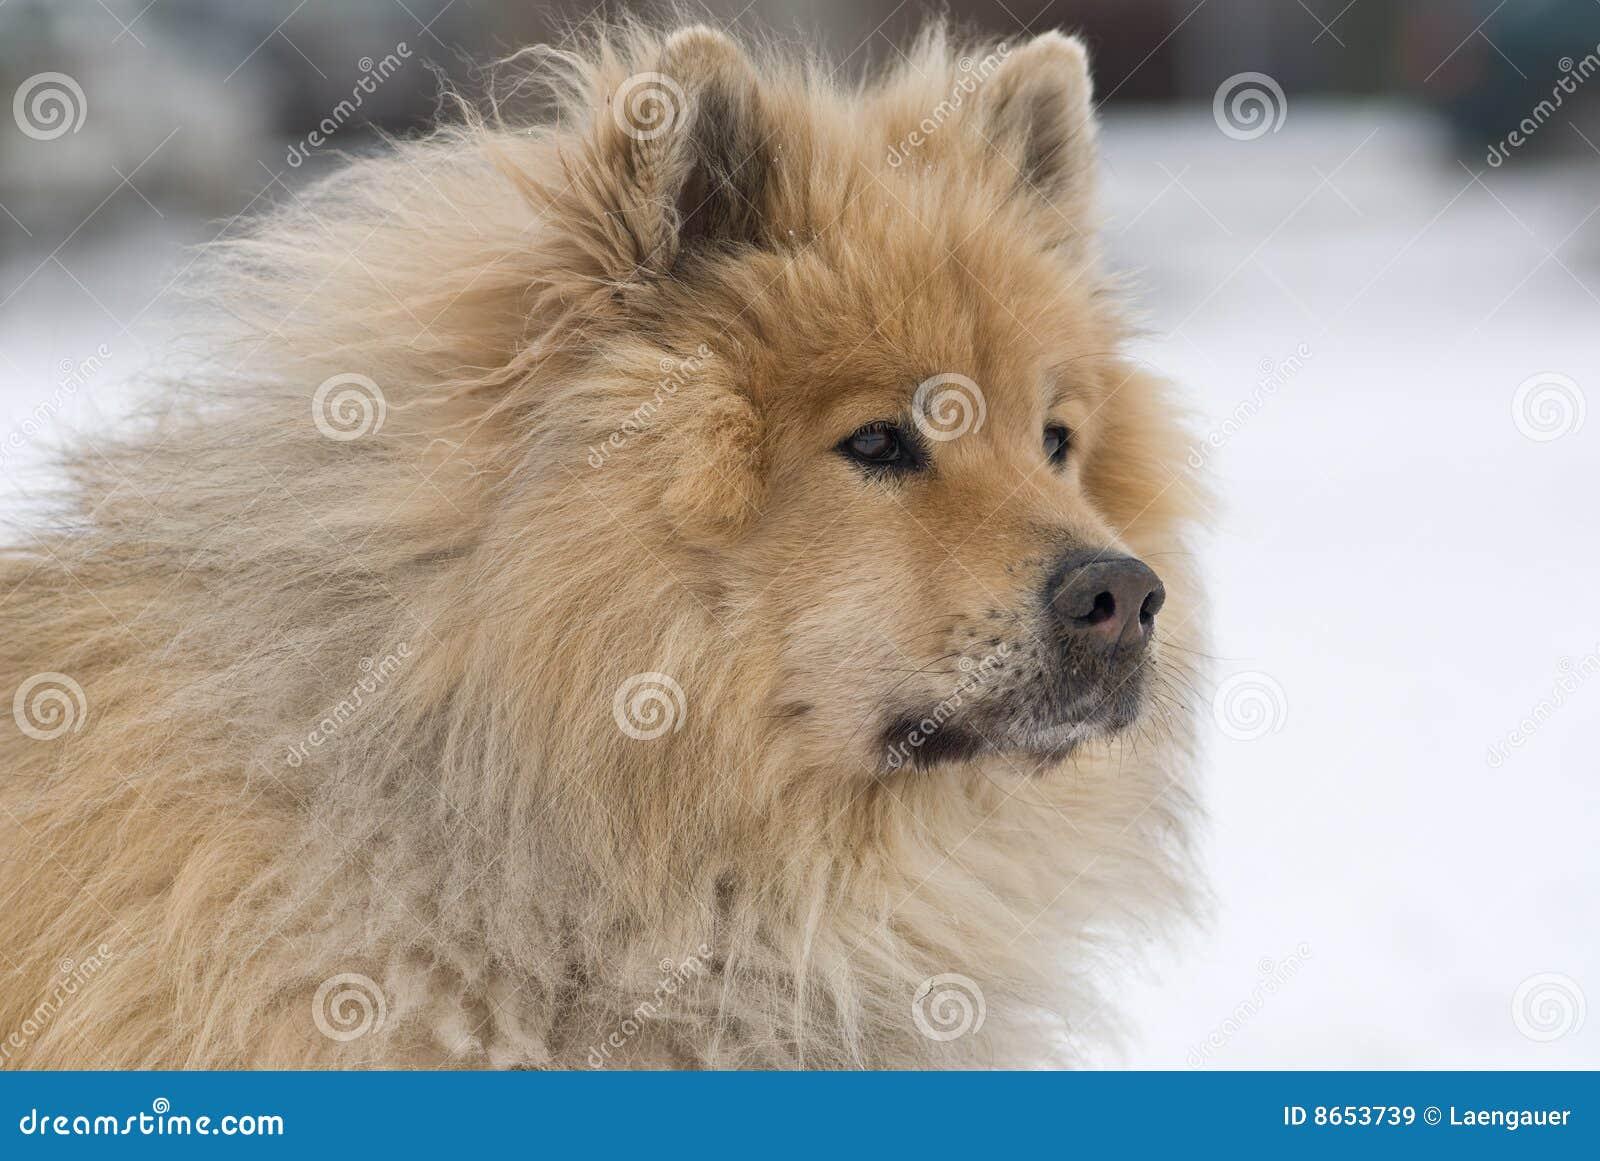 Advertent dog